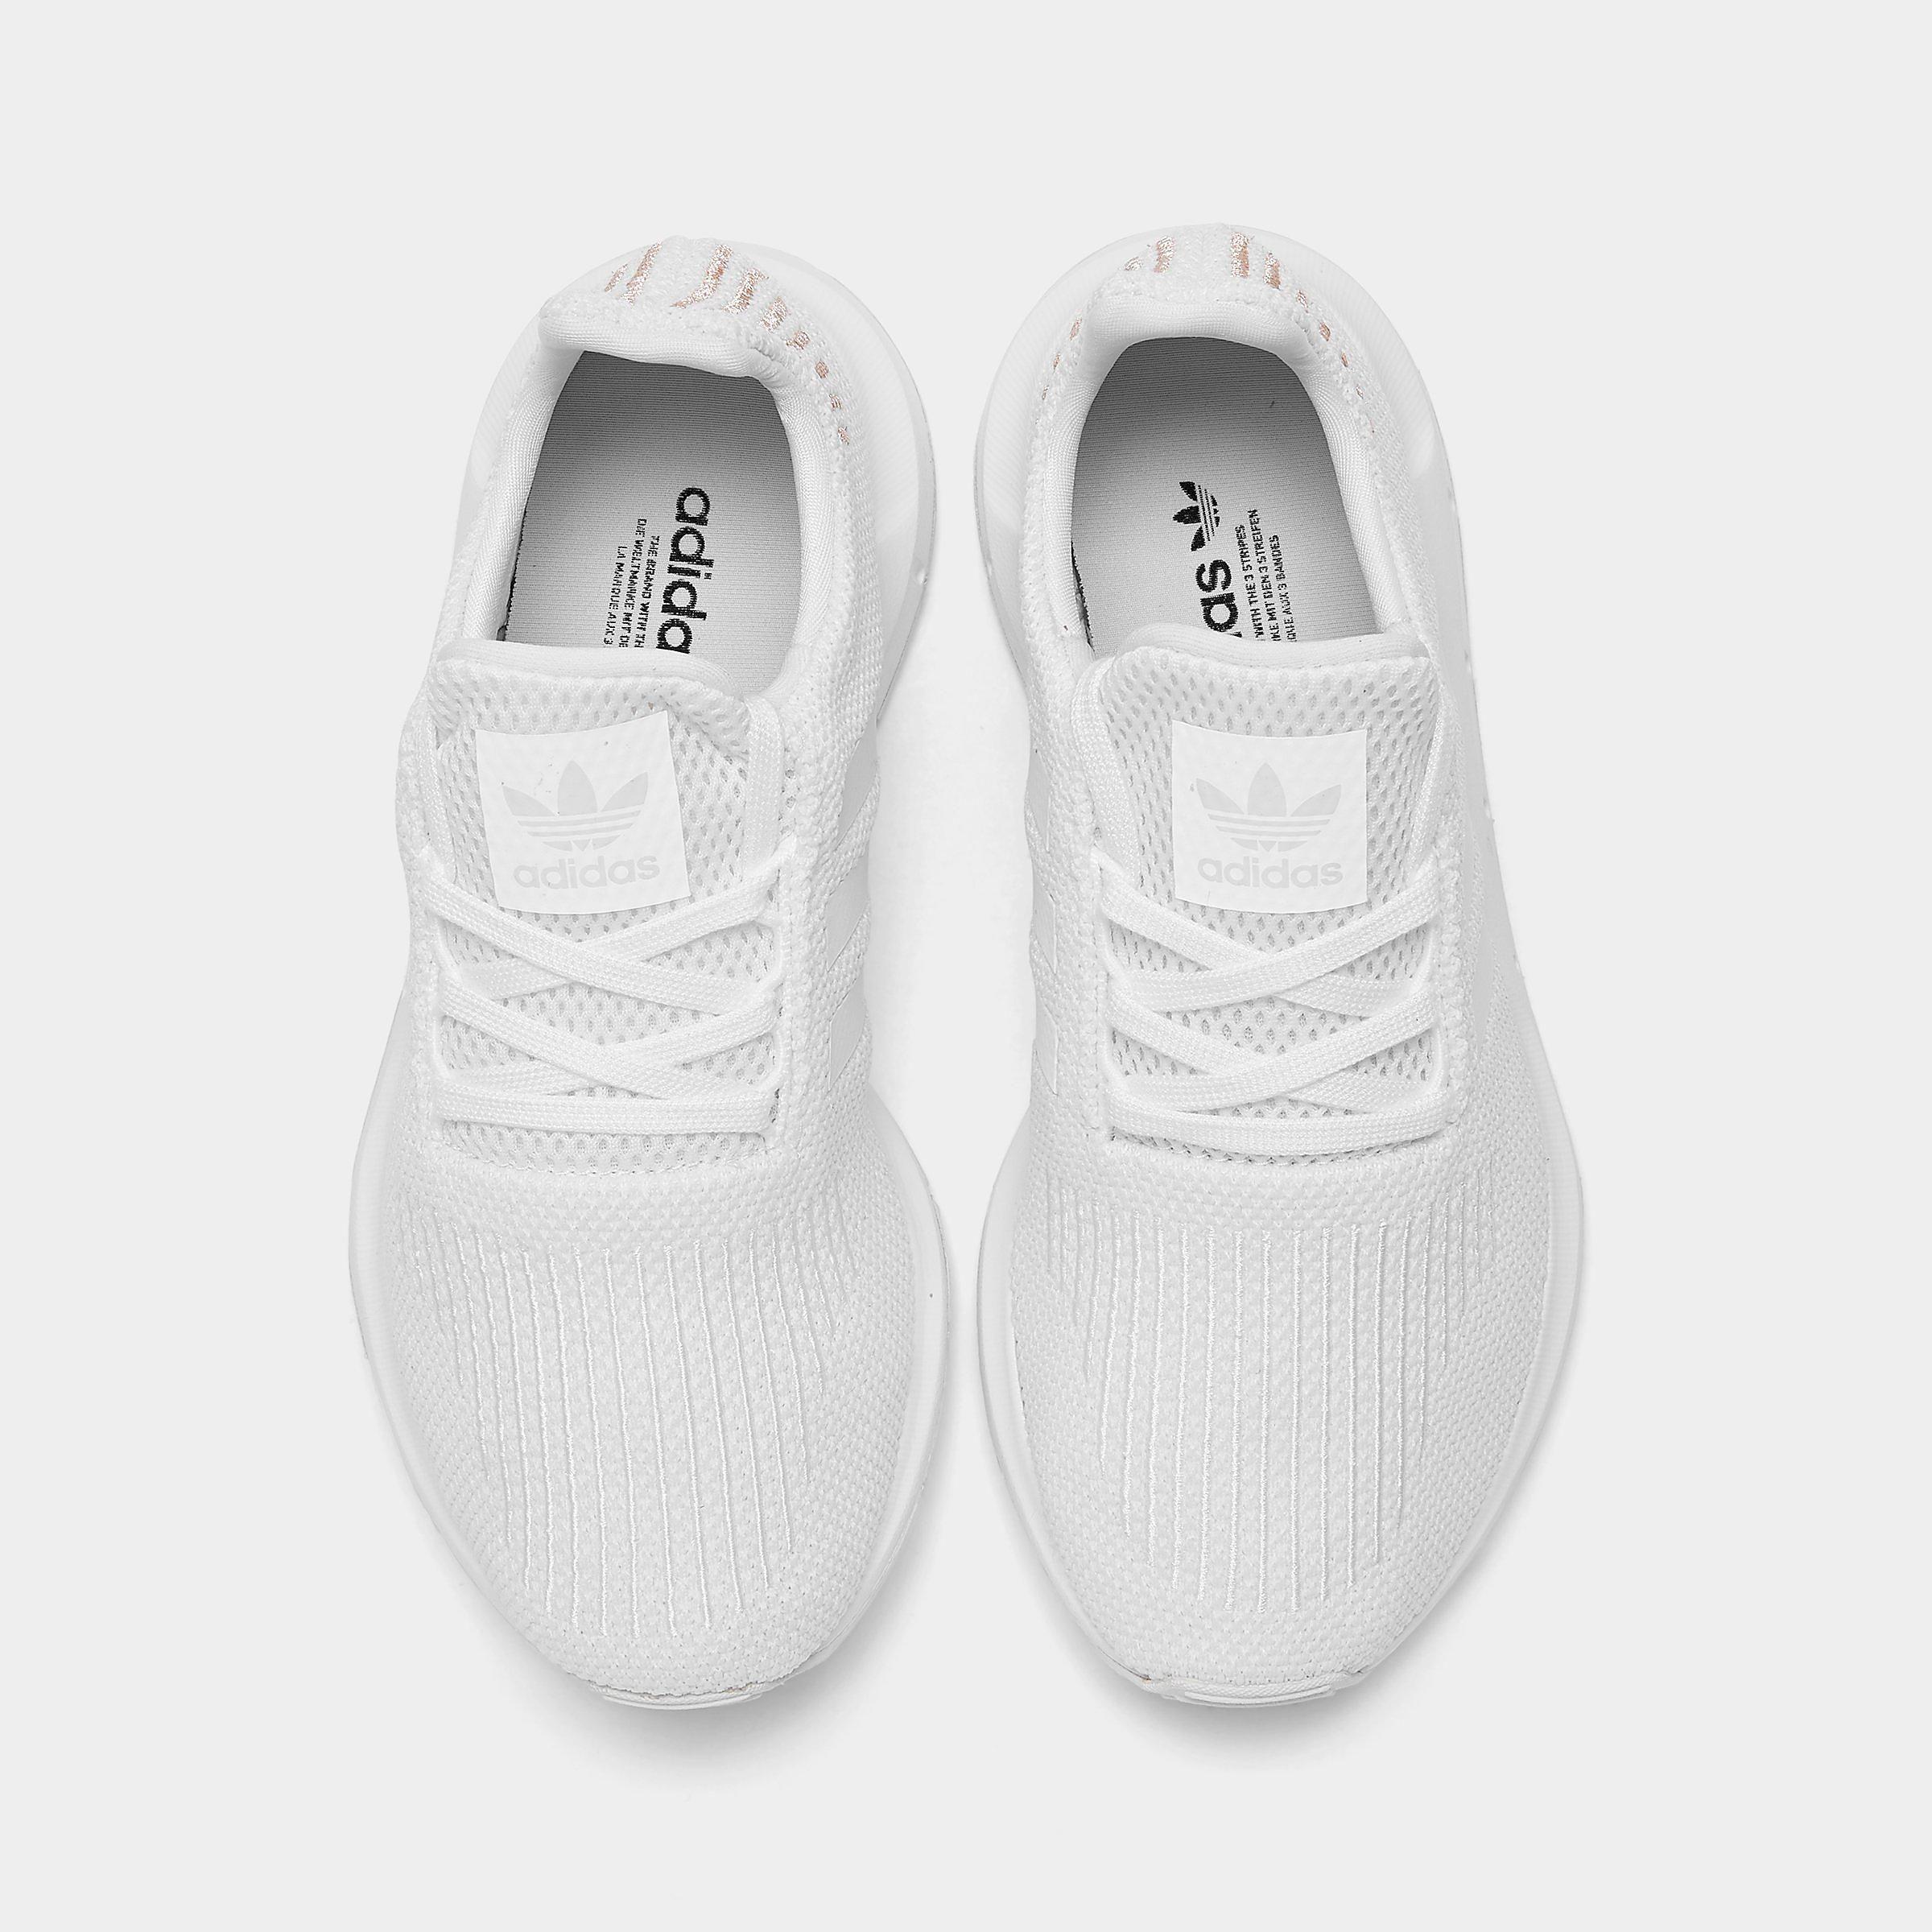 Adidas women, Shoes, Casual shoes